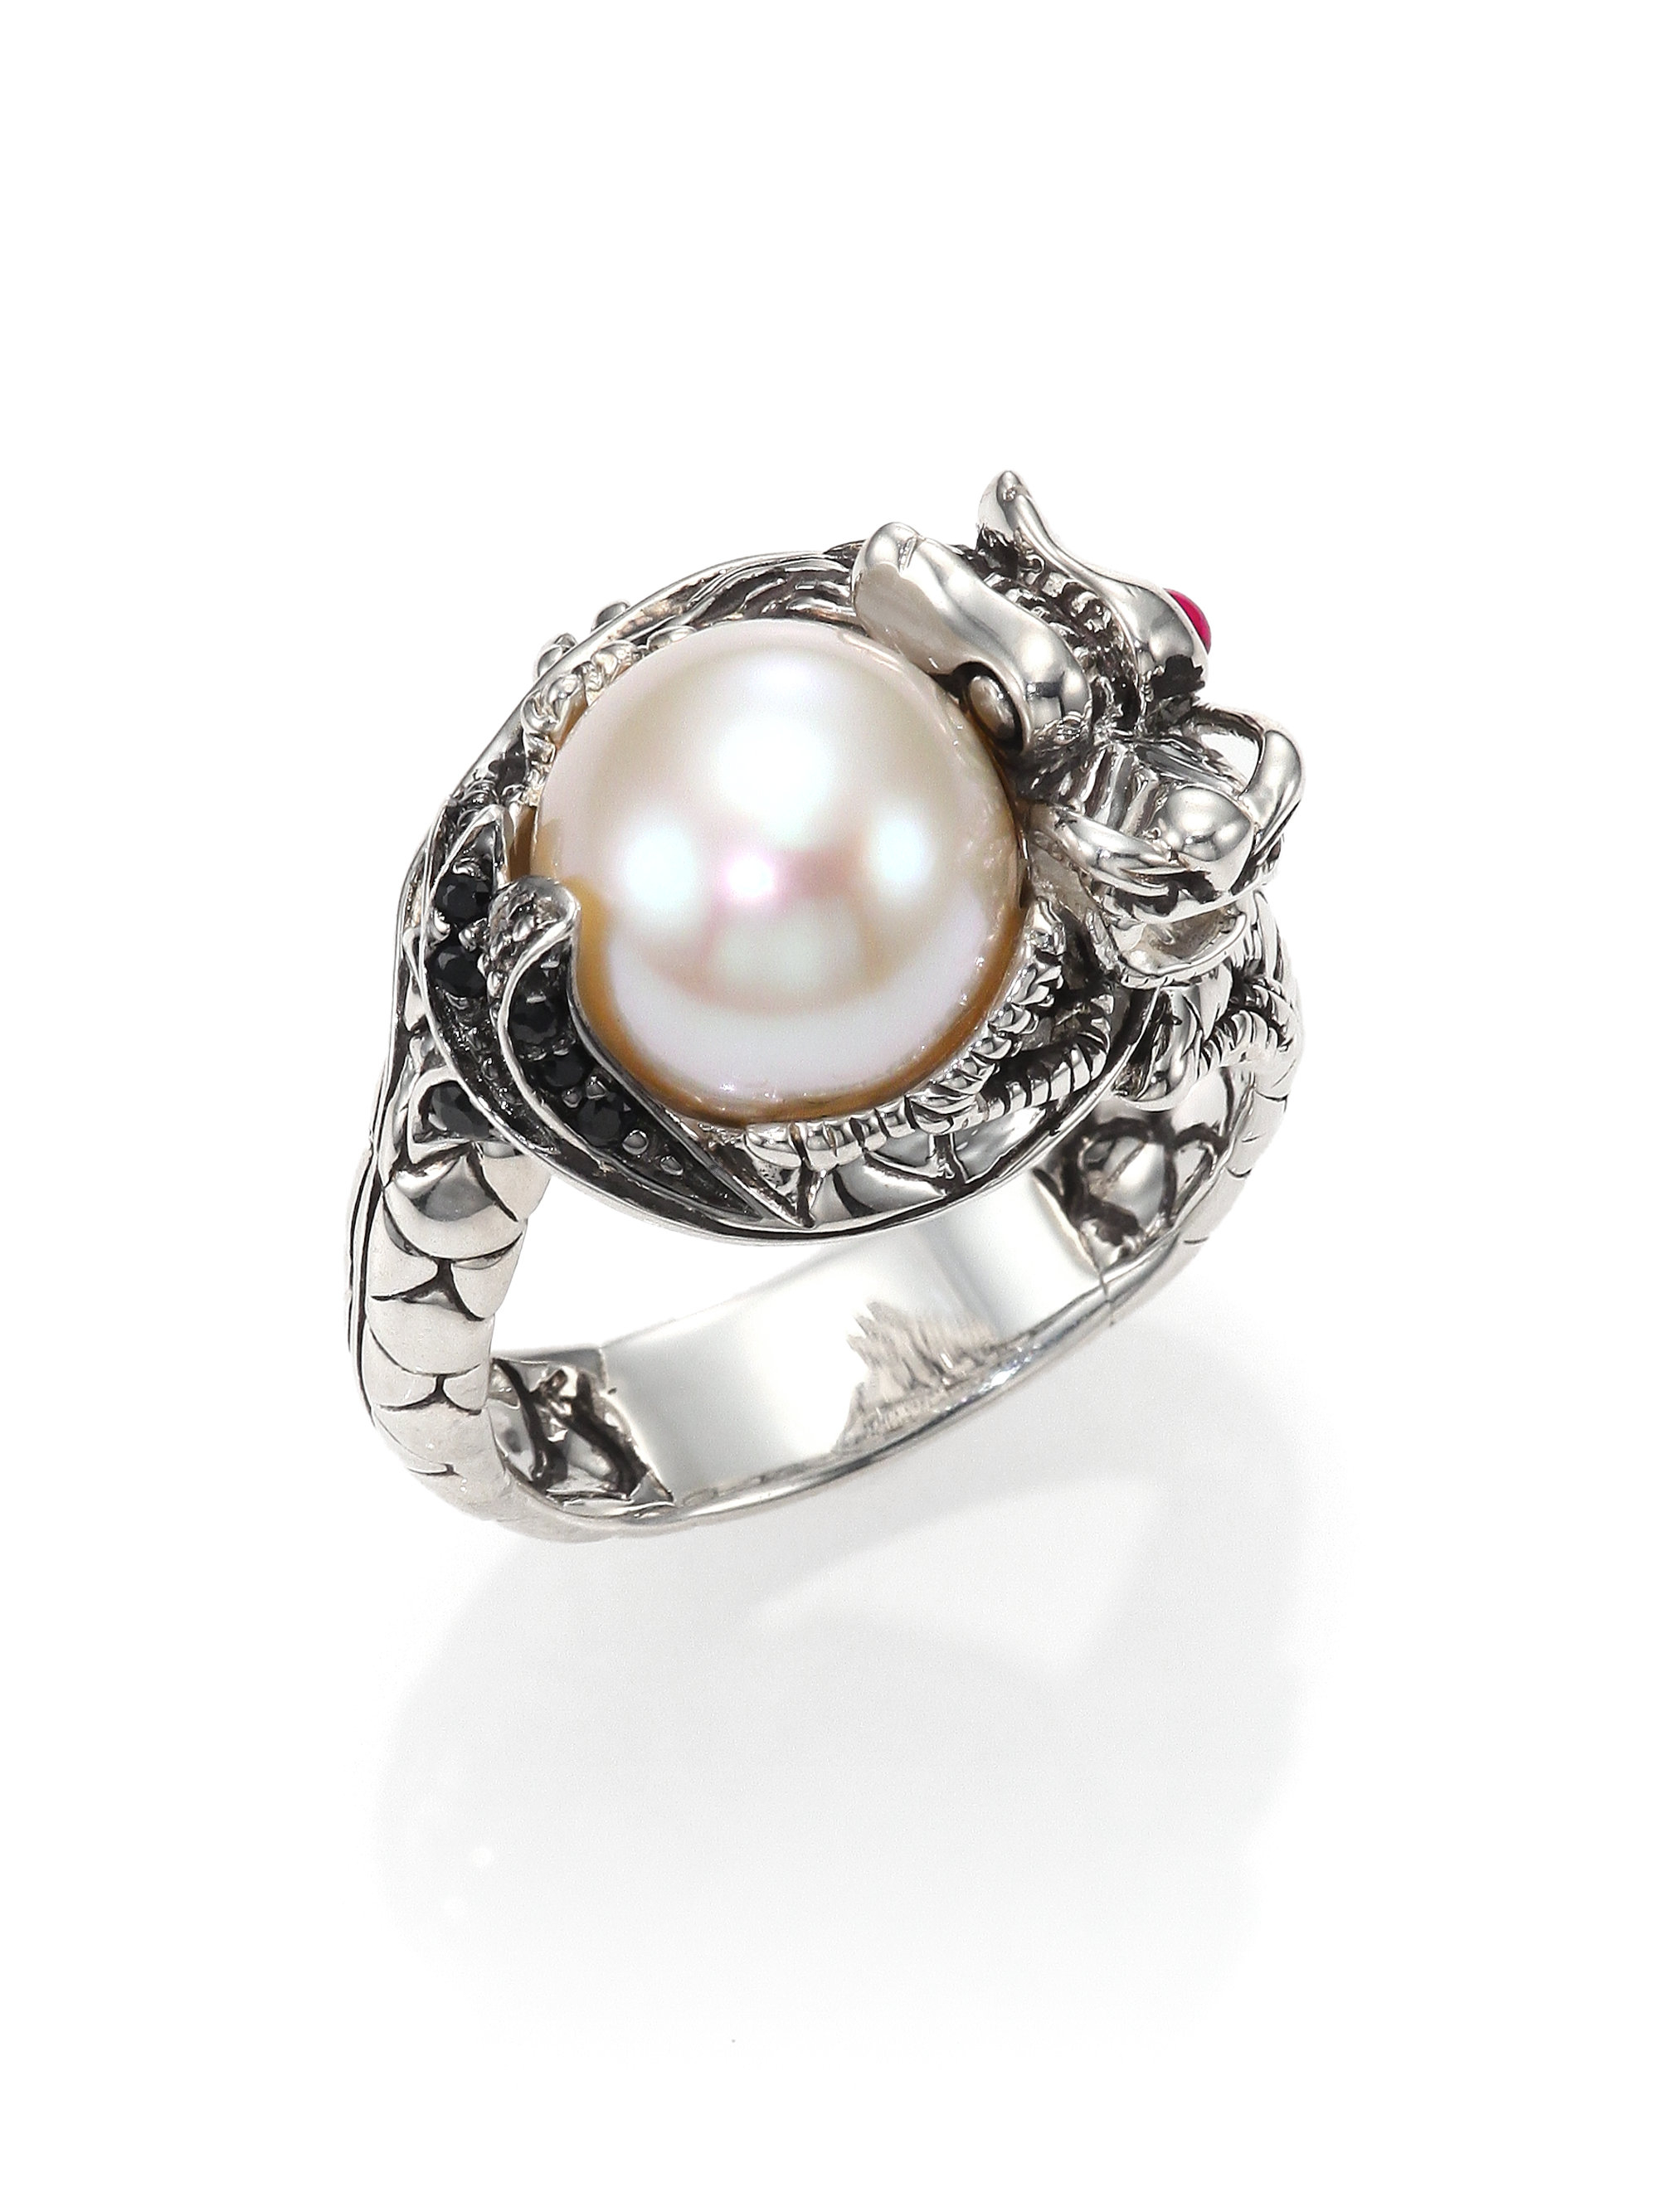 0821c04f2157b John Hardy Metallic Naga 10.5Mm-11Mm White Freshwater Pearl, Black  Sapphire, Ruby & Sterling Silver Small Dragon Ring